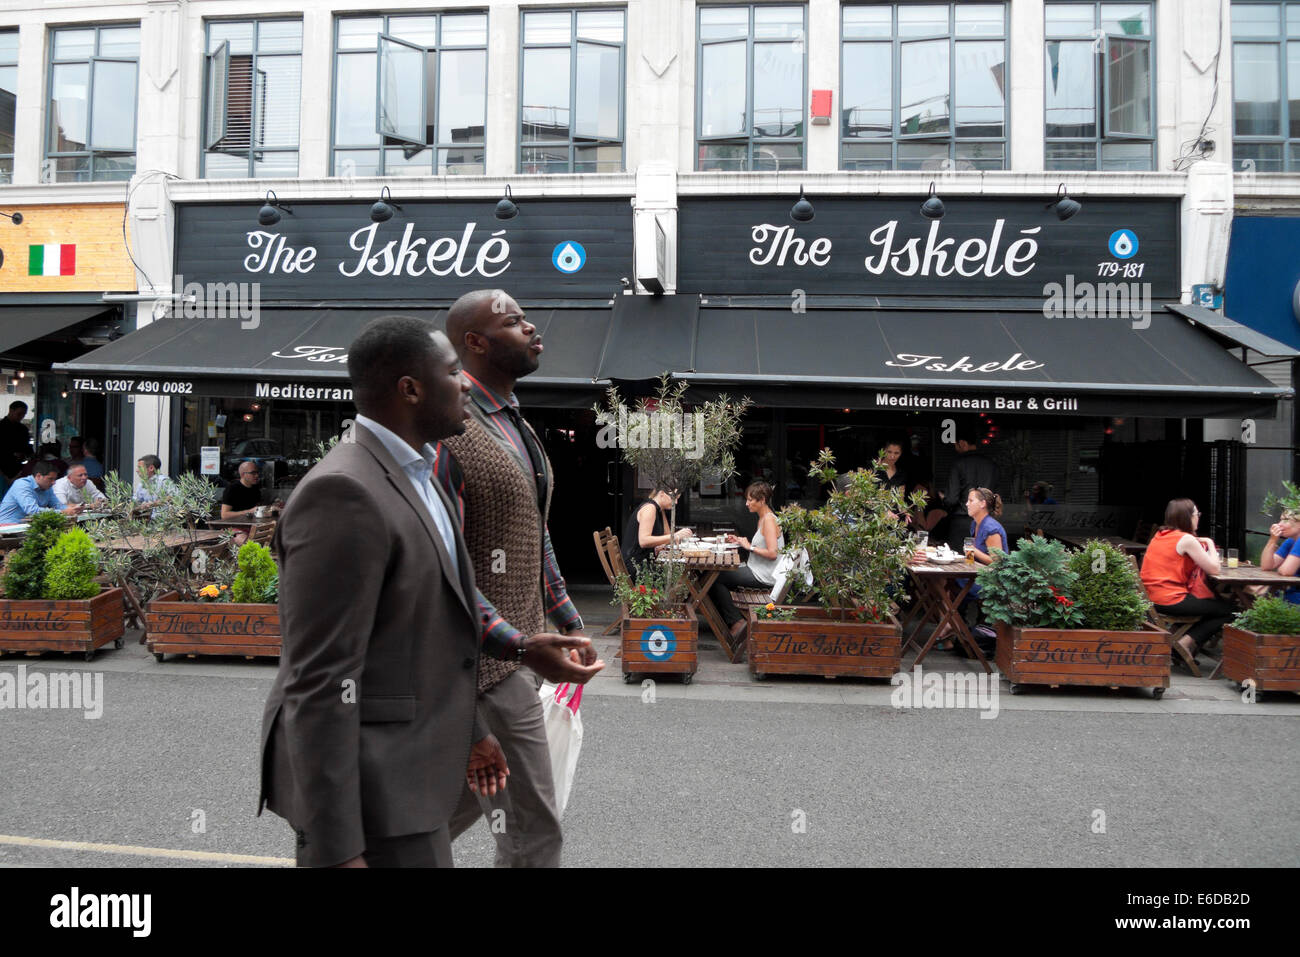 Two men walking past people eating al fresco at The Iskele Mediterranean Bar & Grill in Whitecross Street London - Stock Image